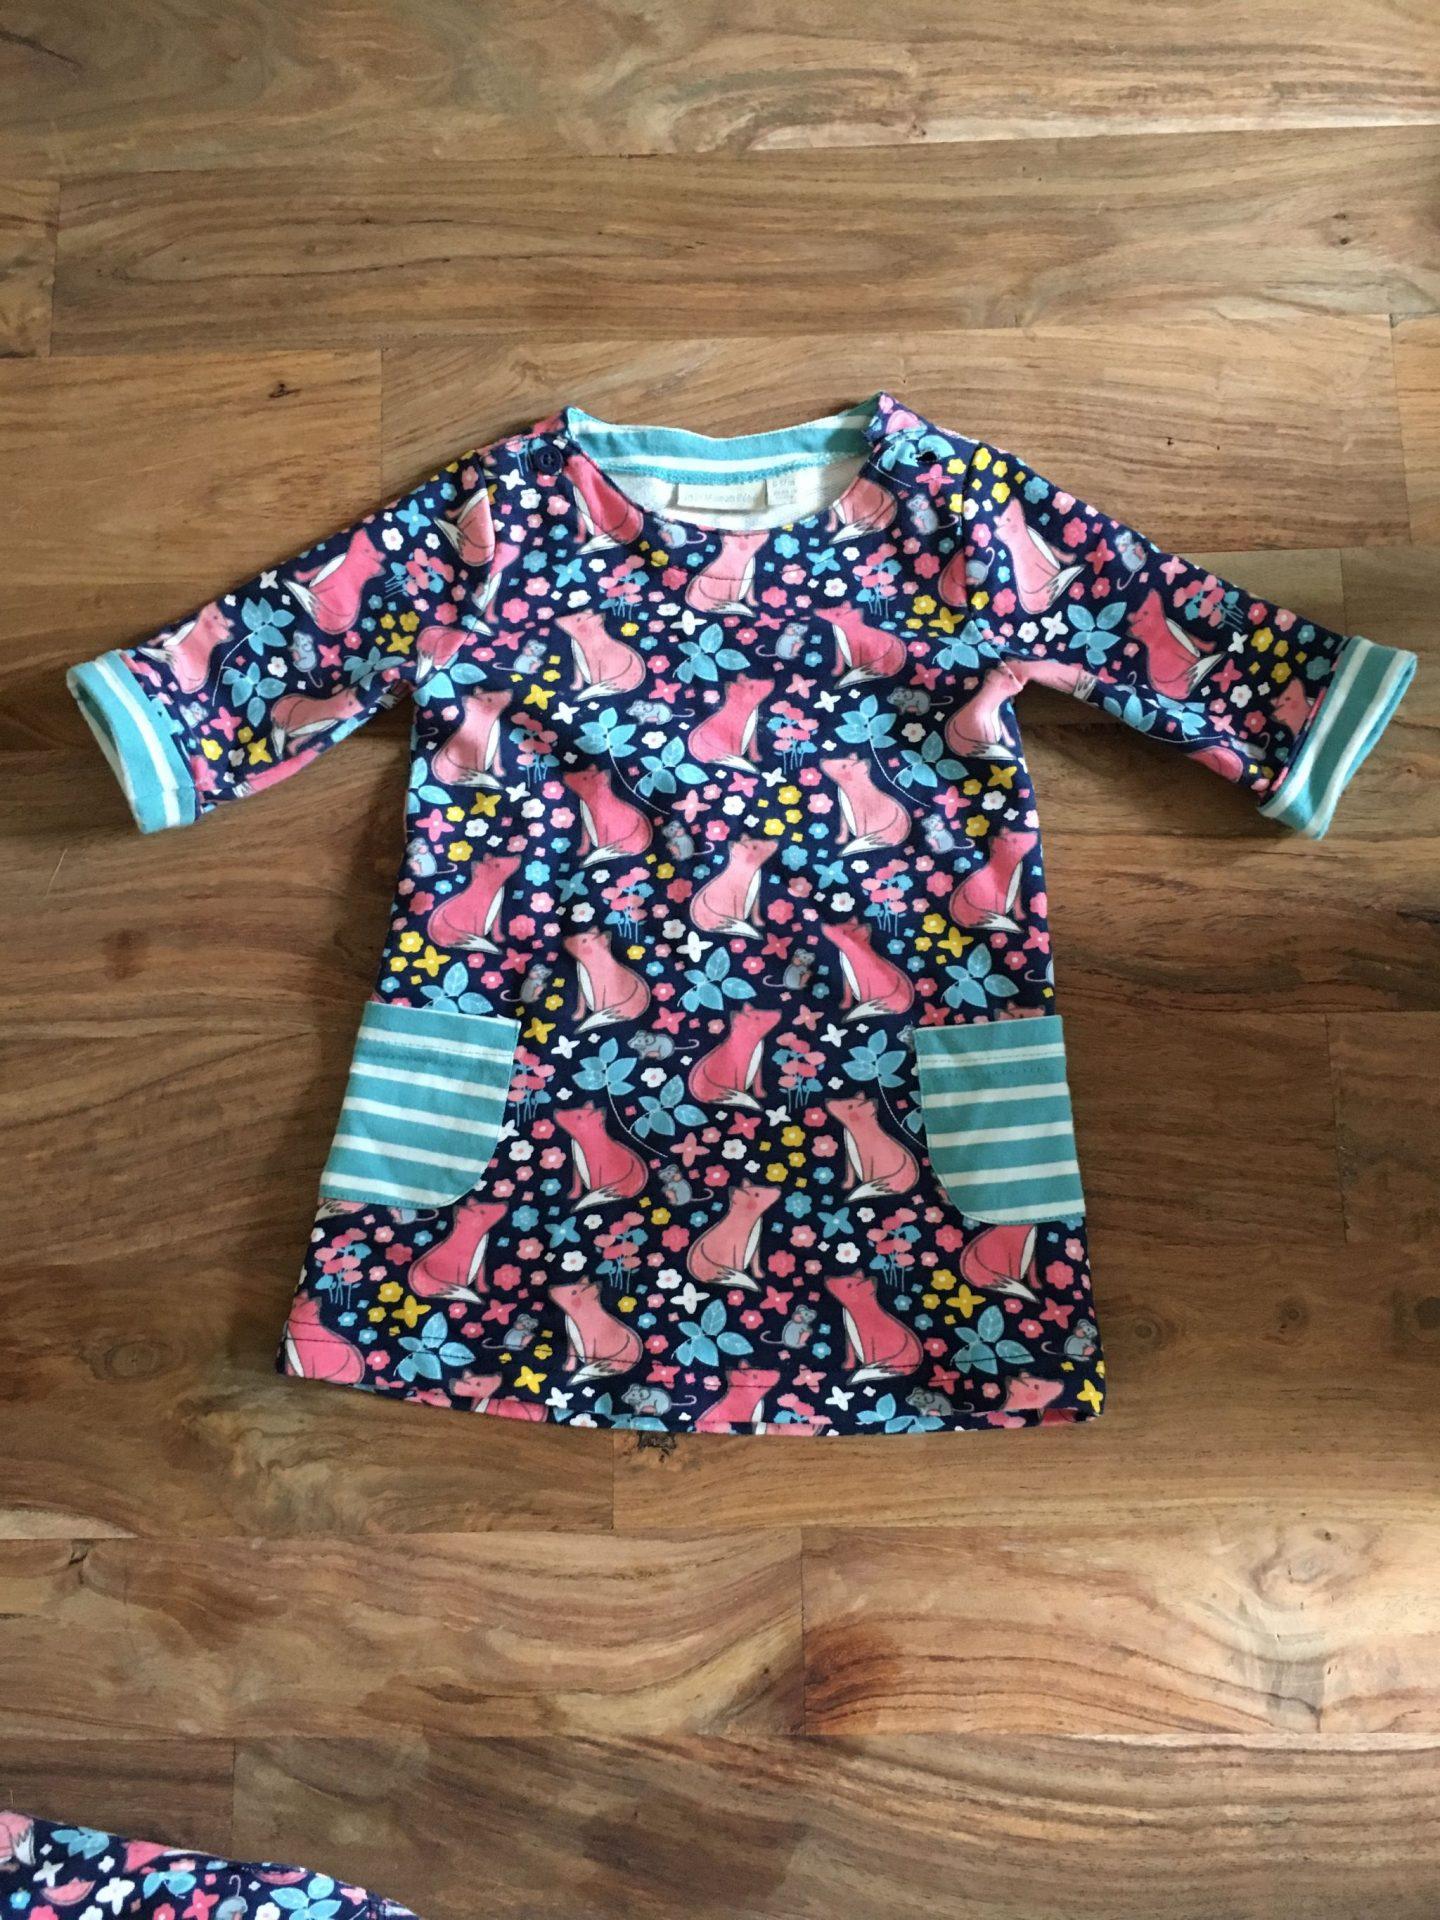 Fox print dress for baby girls by JoJo Maman Bebe